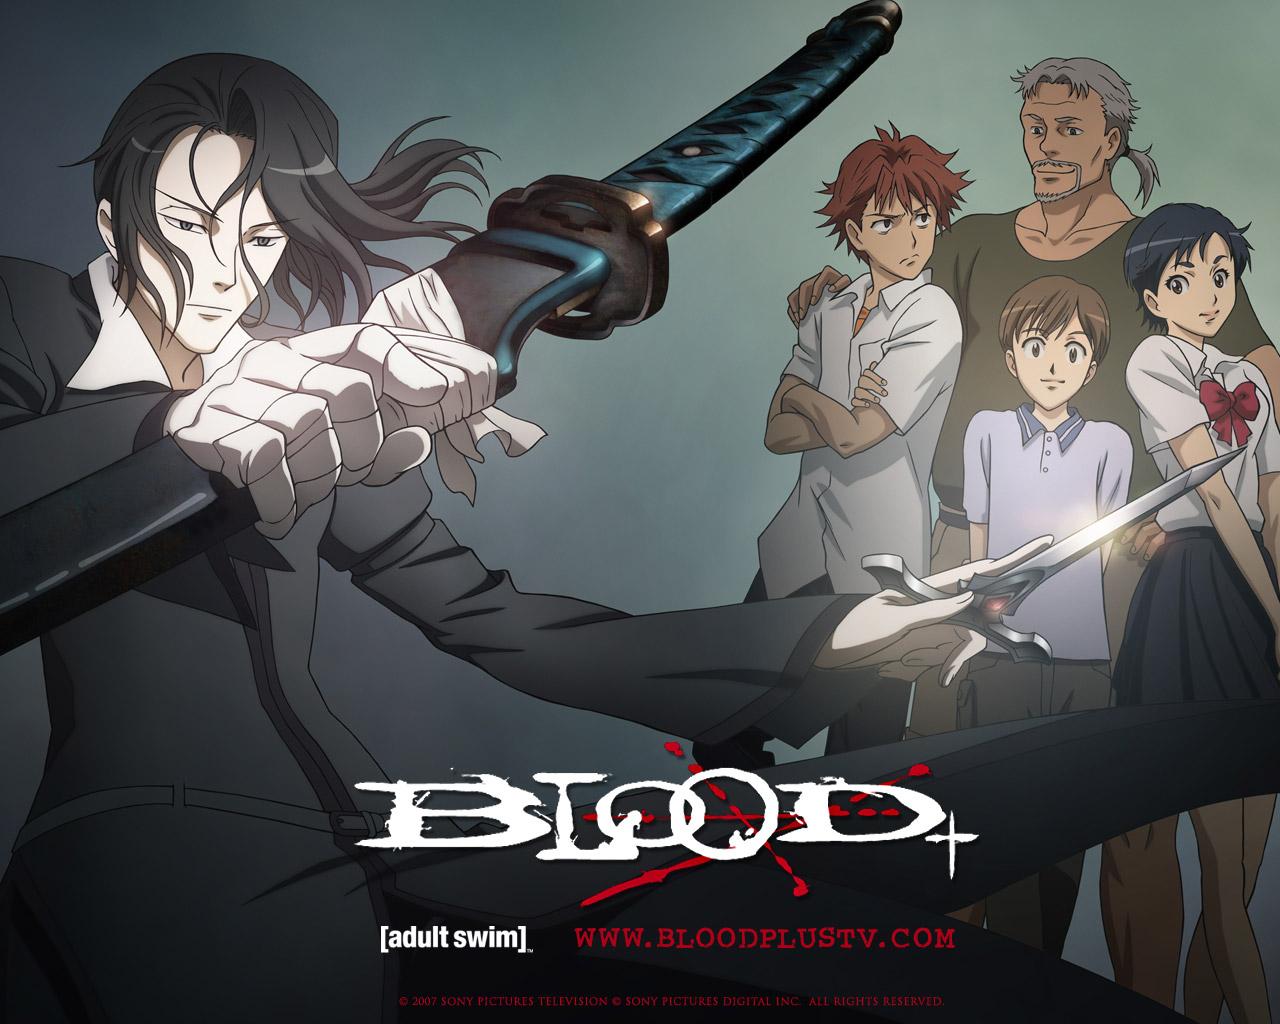 Blood saya riku porn - Blood wallpaper zerochan anime image board jpg  1280x1024